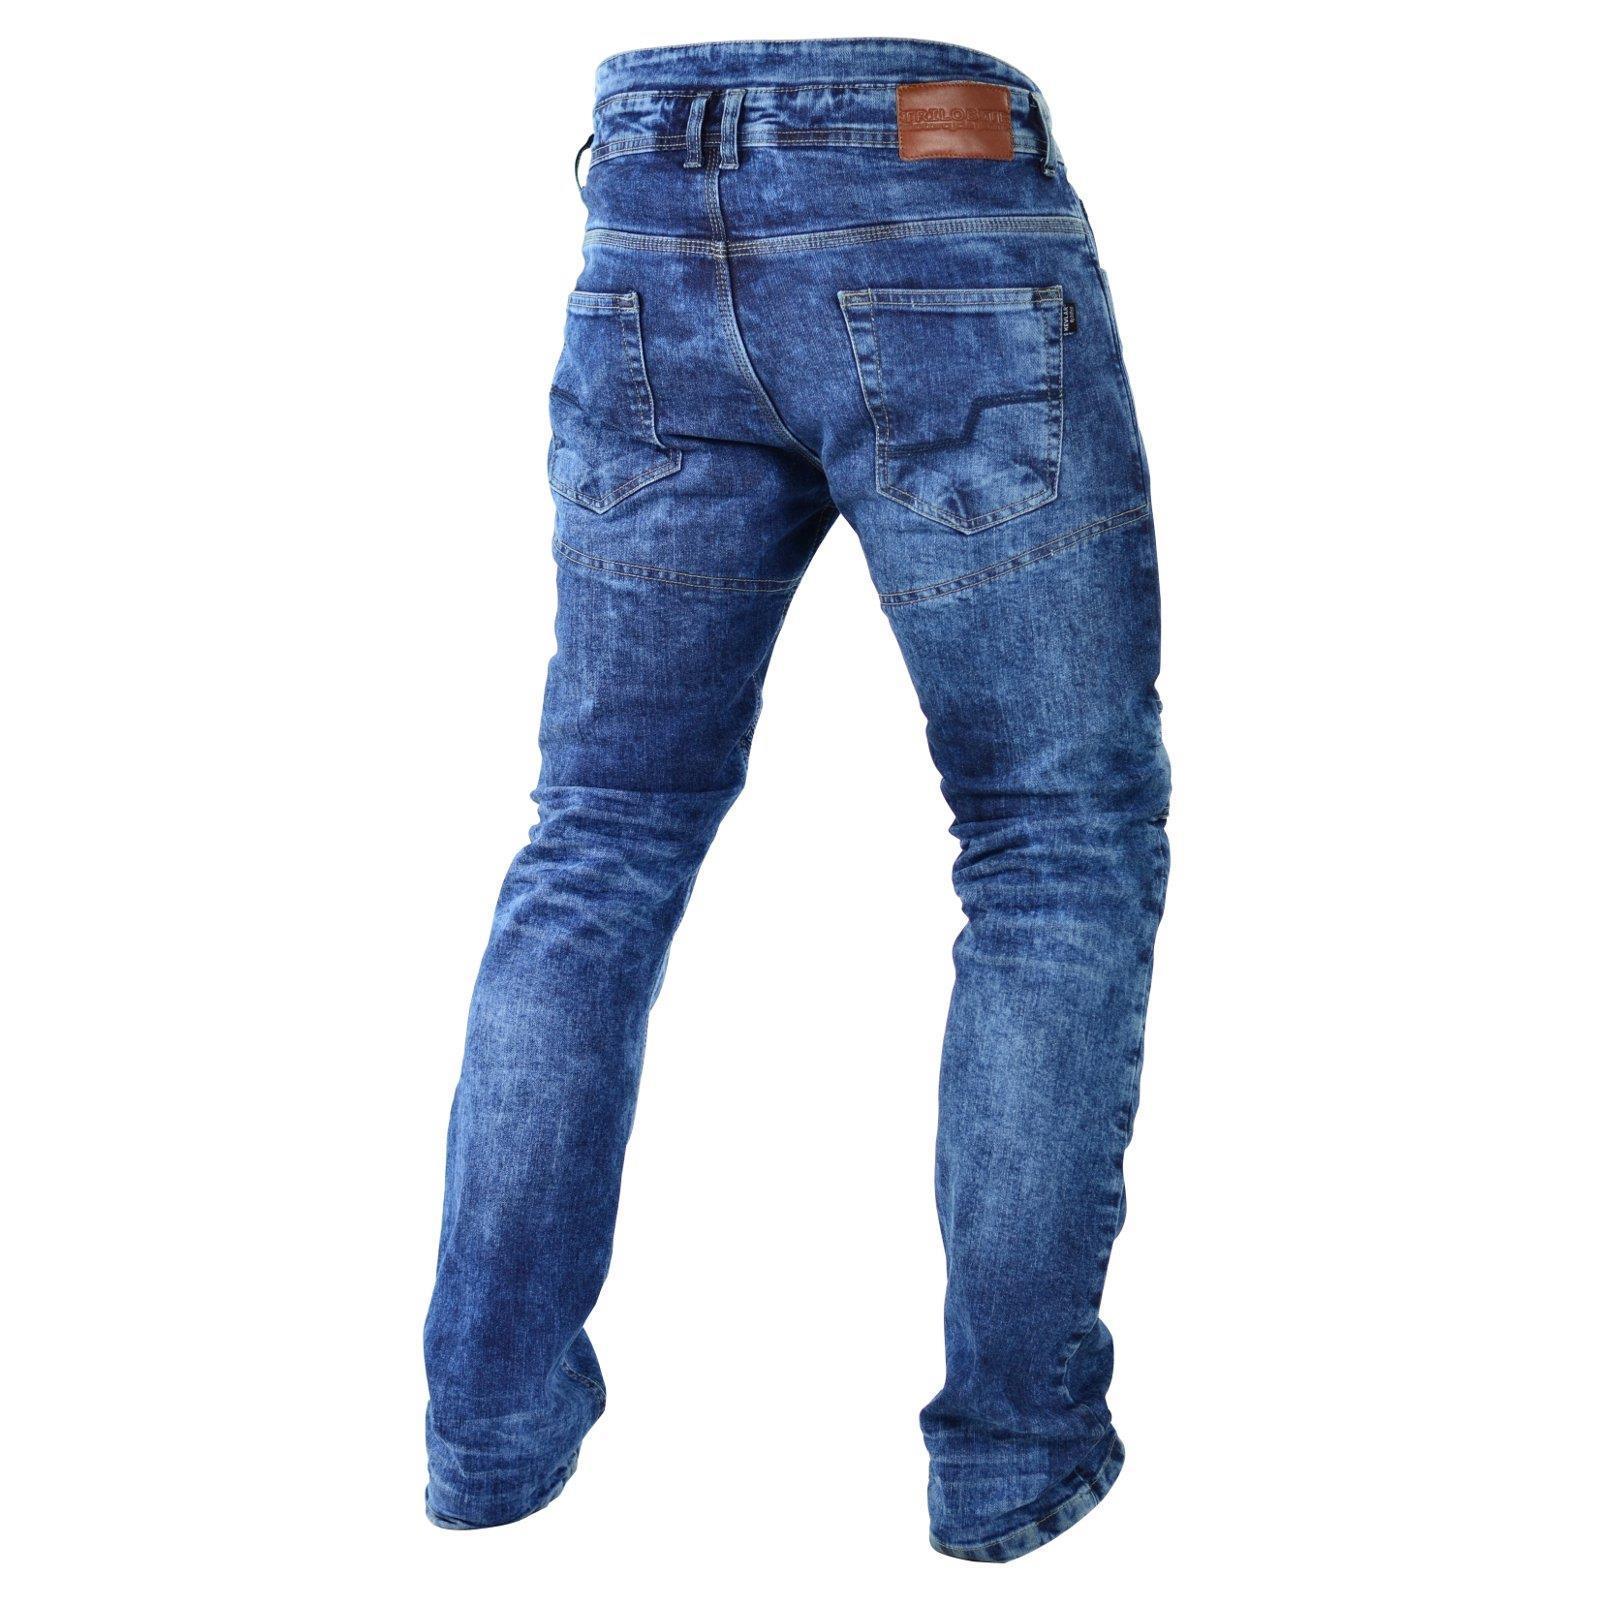 Trilobite-Pantaloni-Moto-Jeans-Abbigliamento-Parado-MICAS-URBAN-DUAL-PANTS-ACID miniatura 54